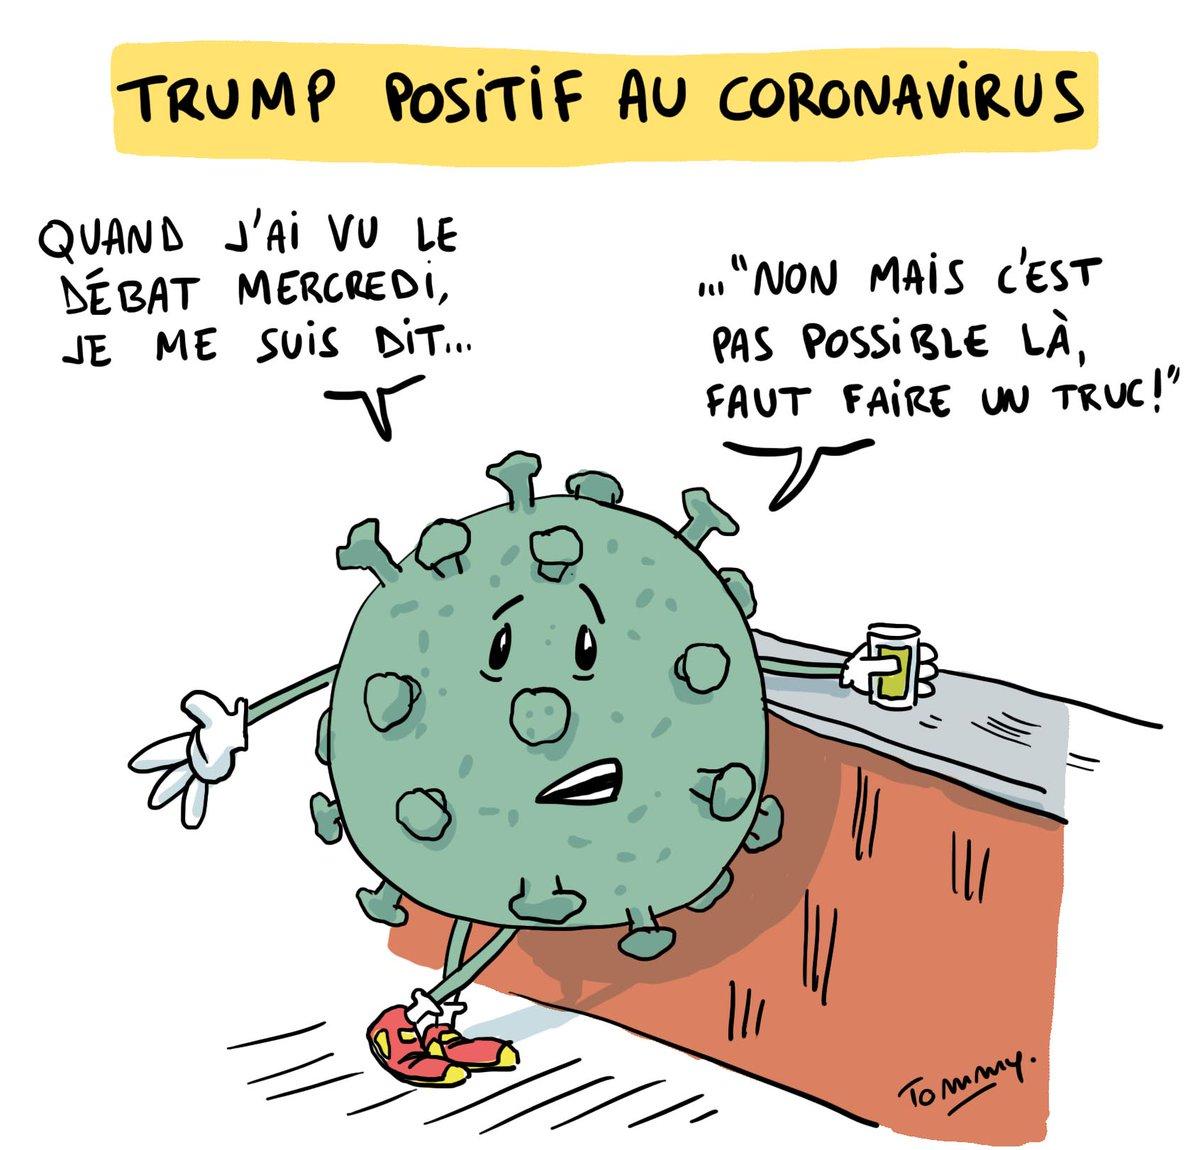 Tommy Dessine On Twitter Trump Positif Au Coronavirus Coronavirus Trumphascovid Trumpcovid Covid